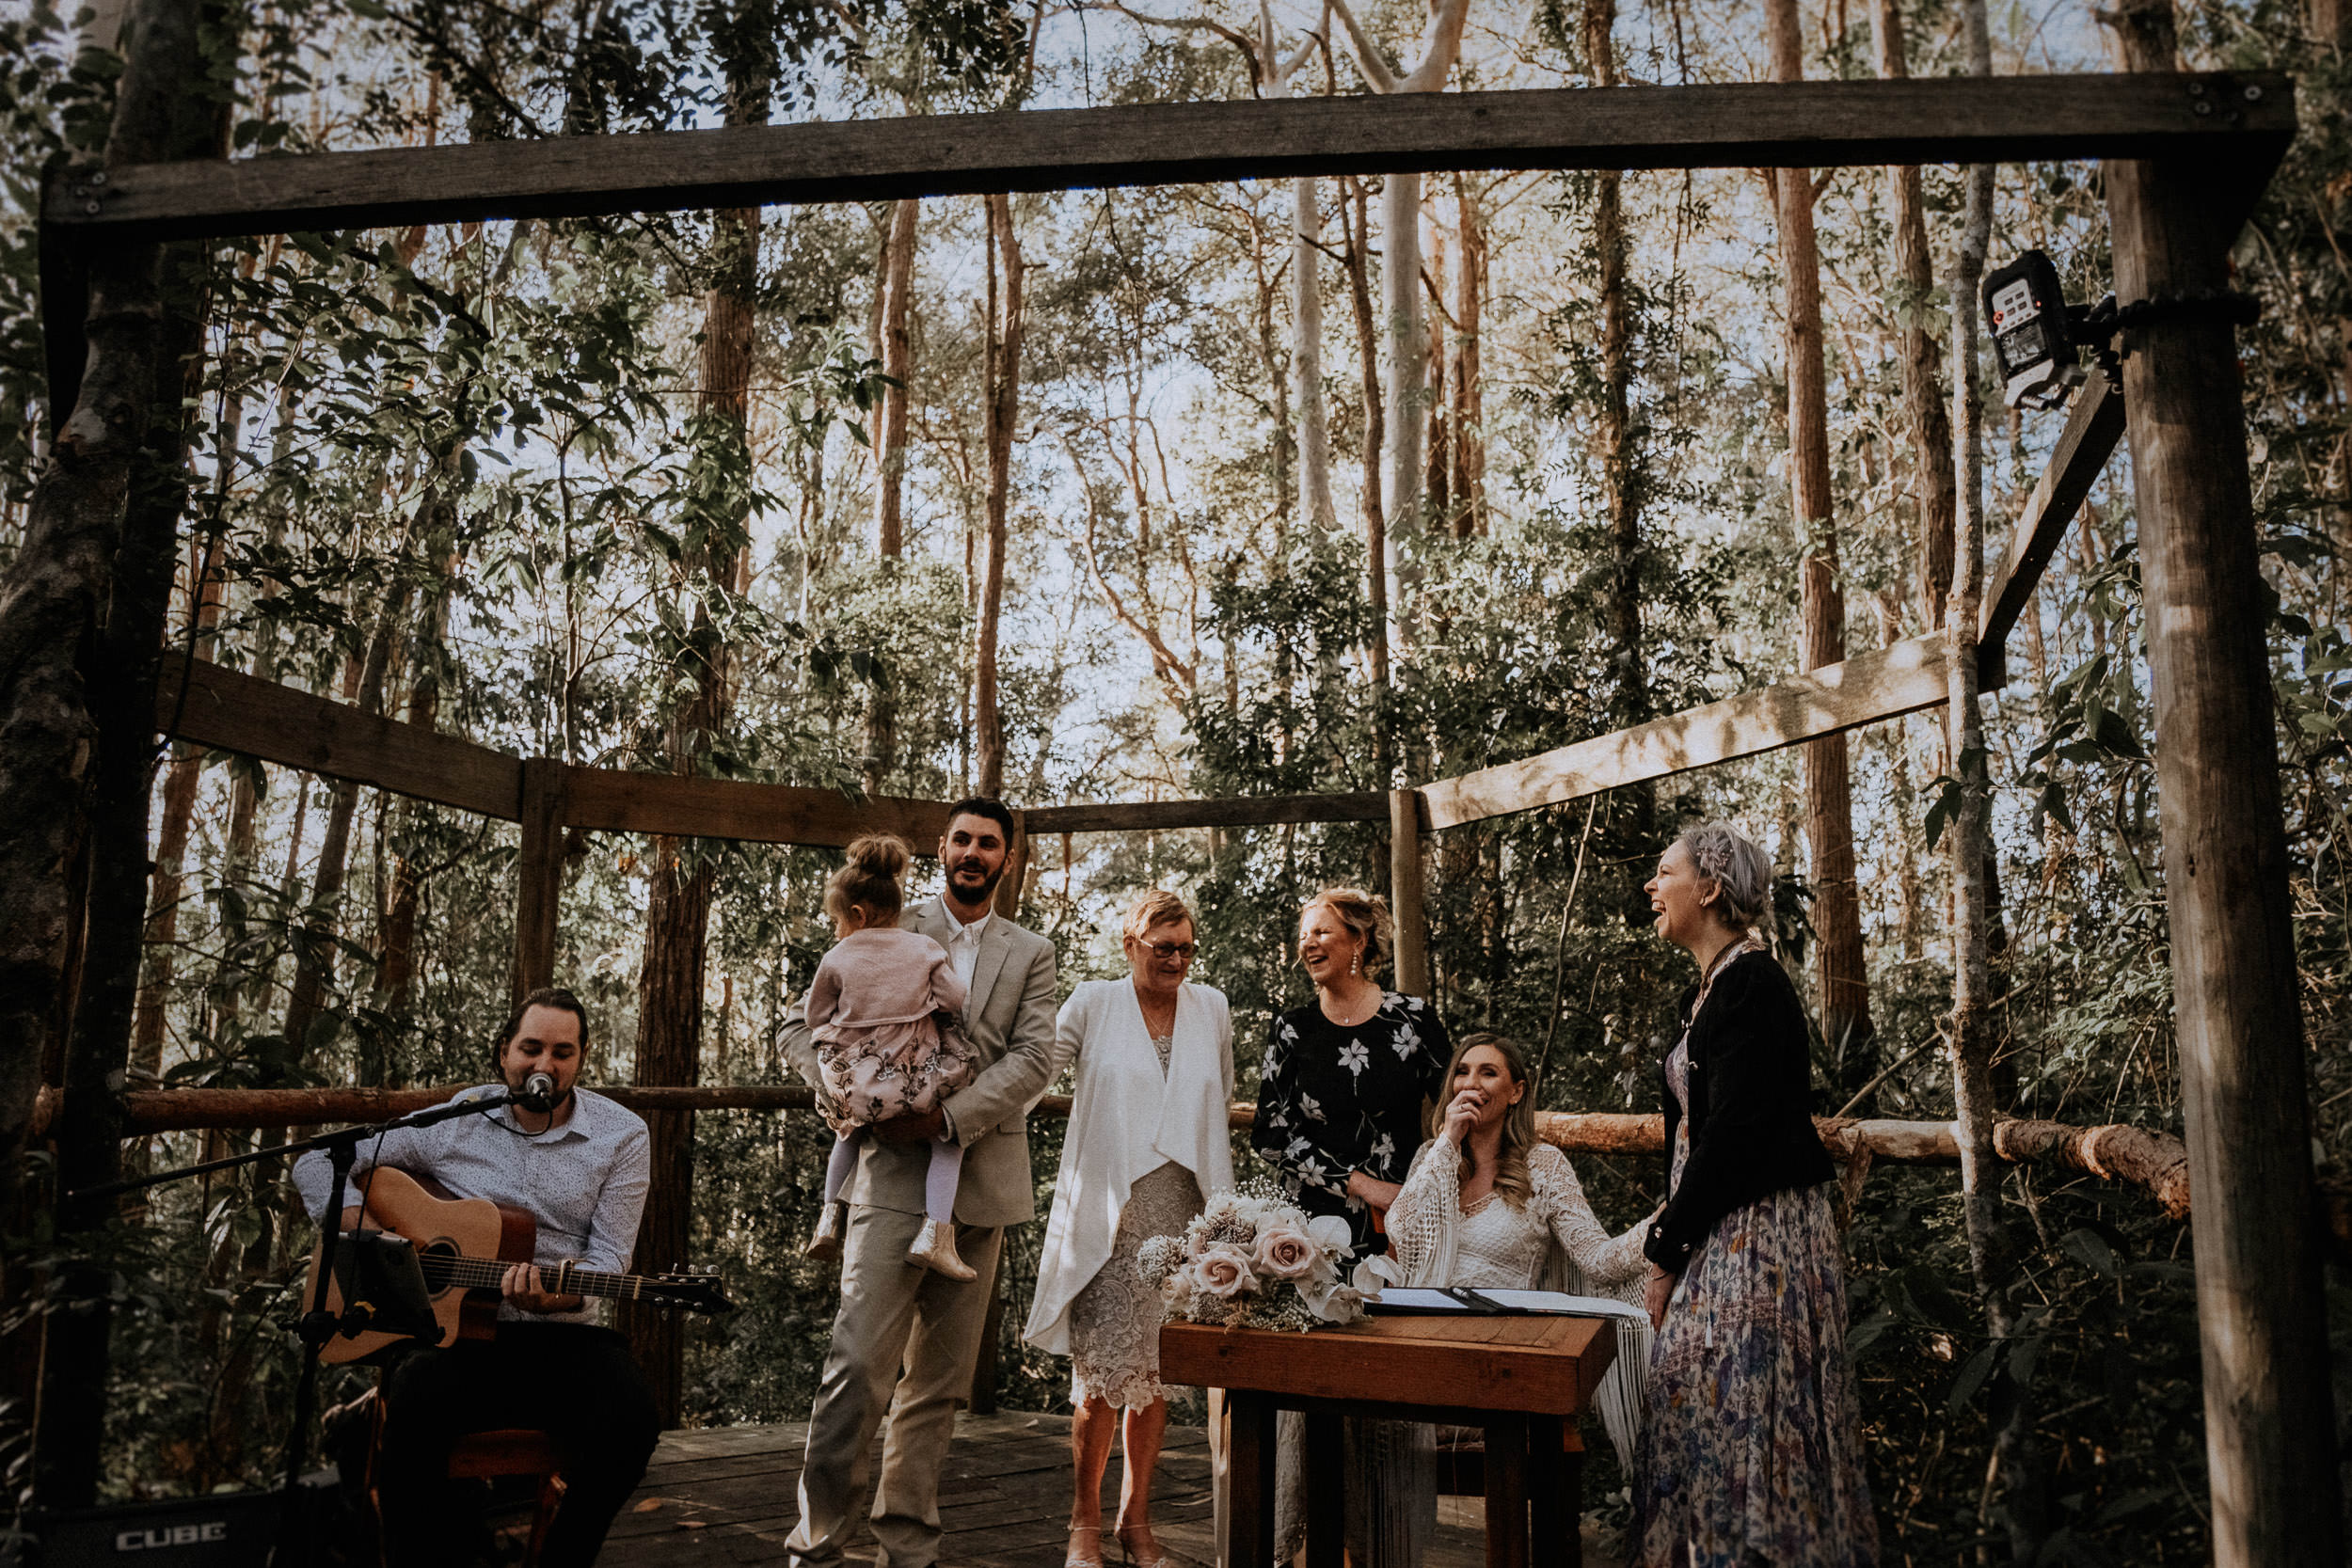 S&A Elopement - Kings & Thieves - Shred 'Til Dead - Central Coast Beach Forest Wedding - 276.jpg